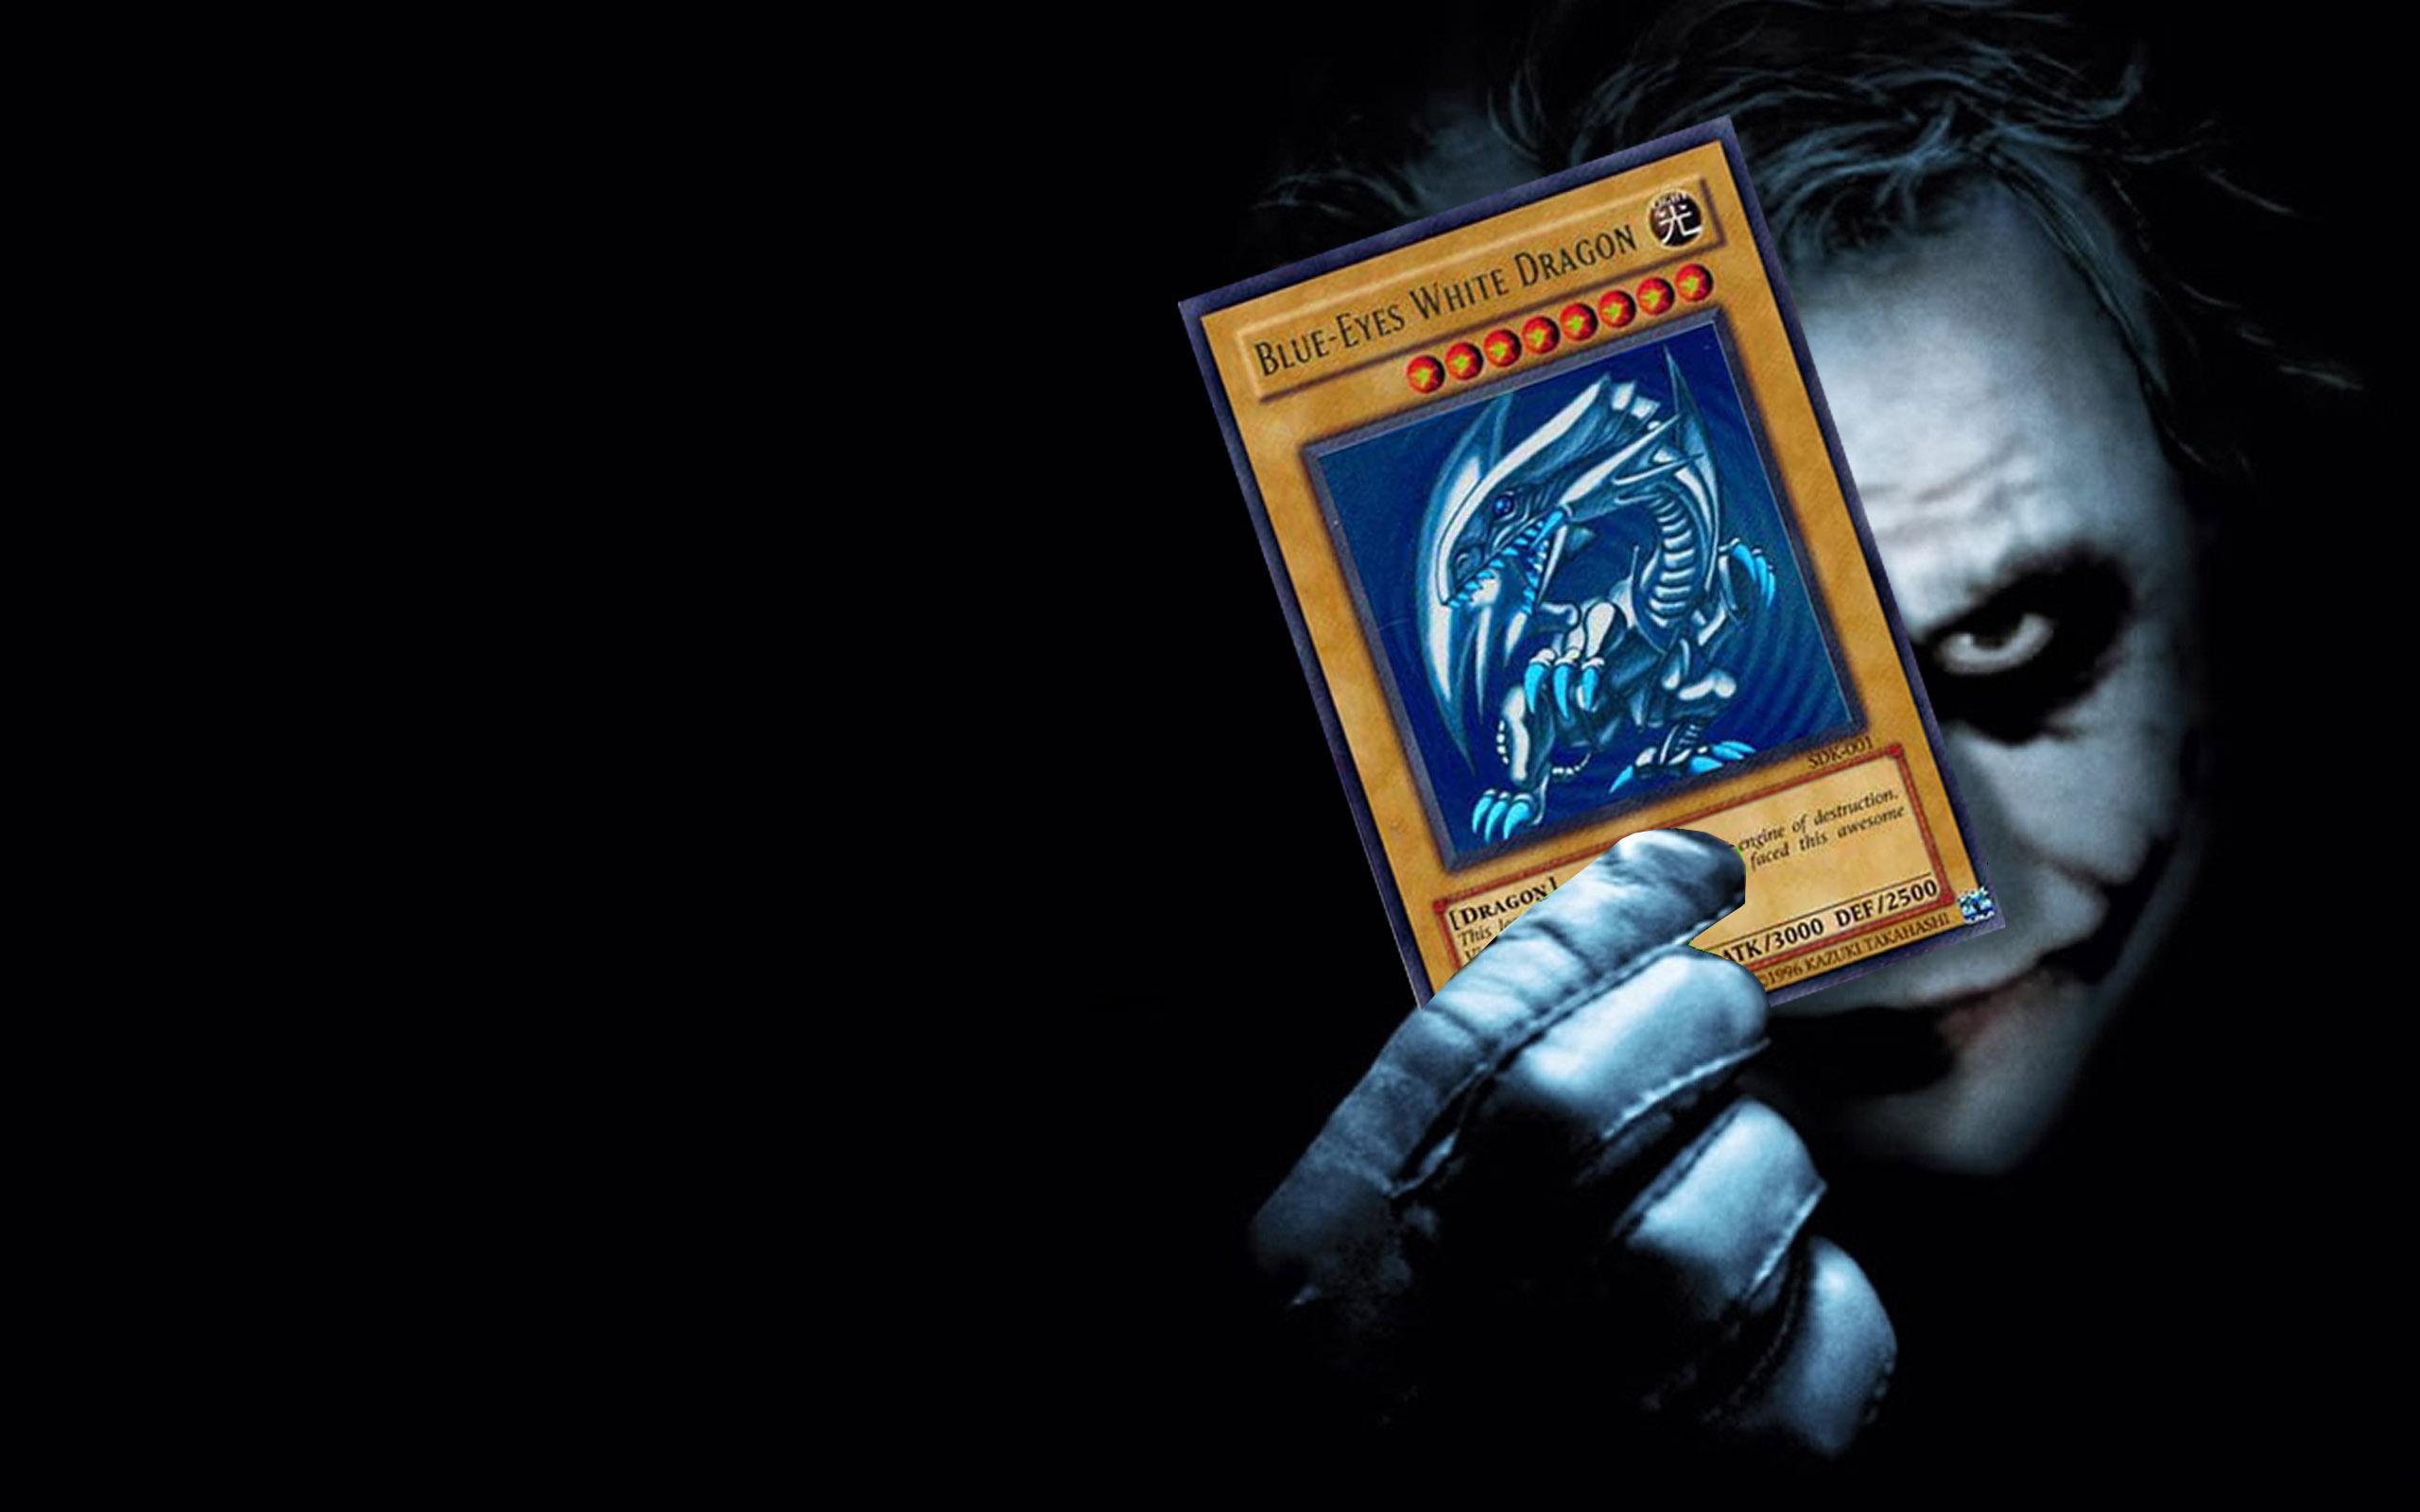 dark knight yu-gi-oh! cards joker playing card wallpaper background ...